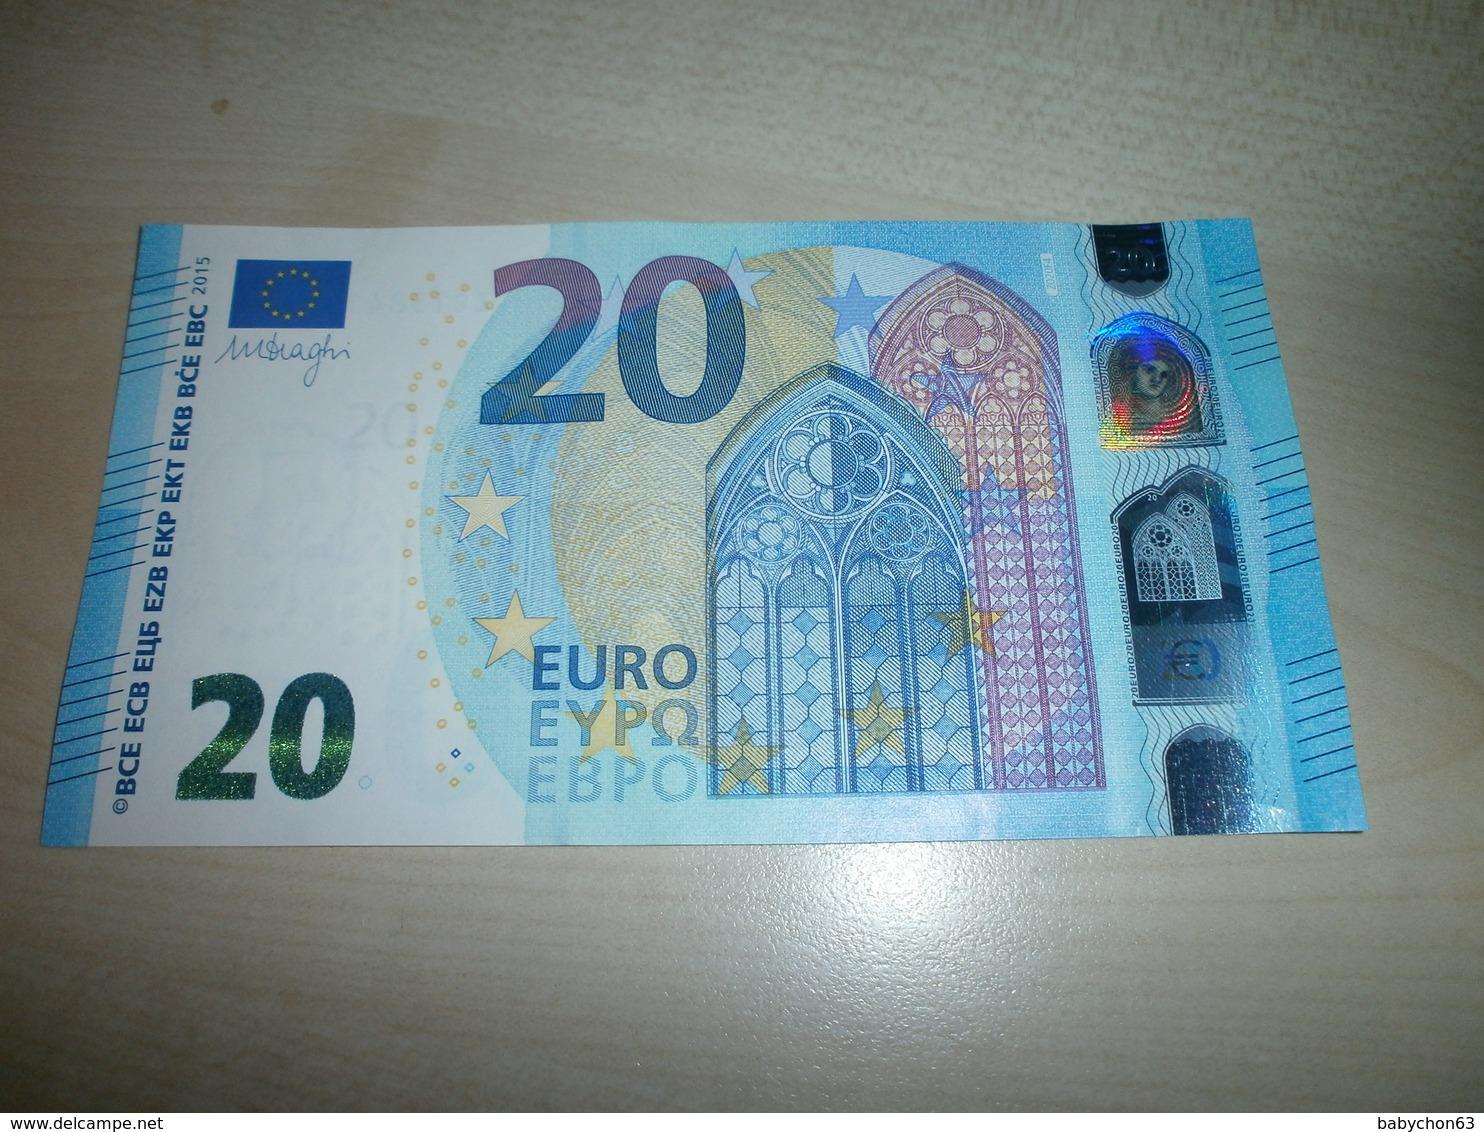 20 EUROS (Z Z020 F4) - EURO